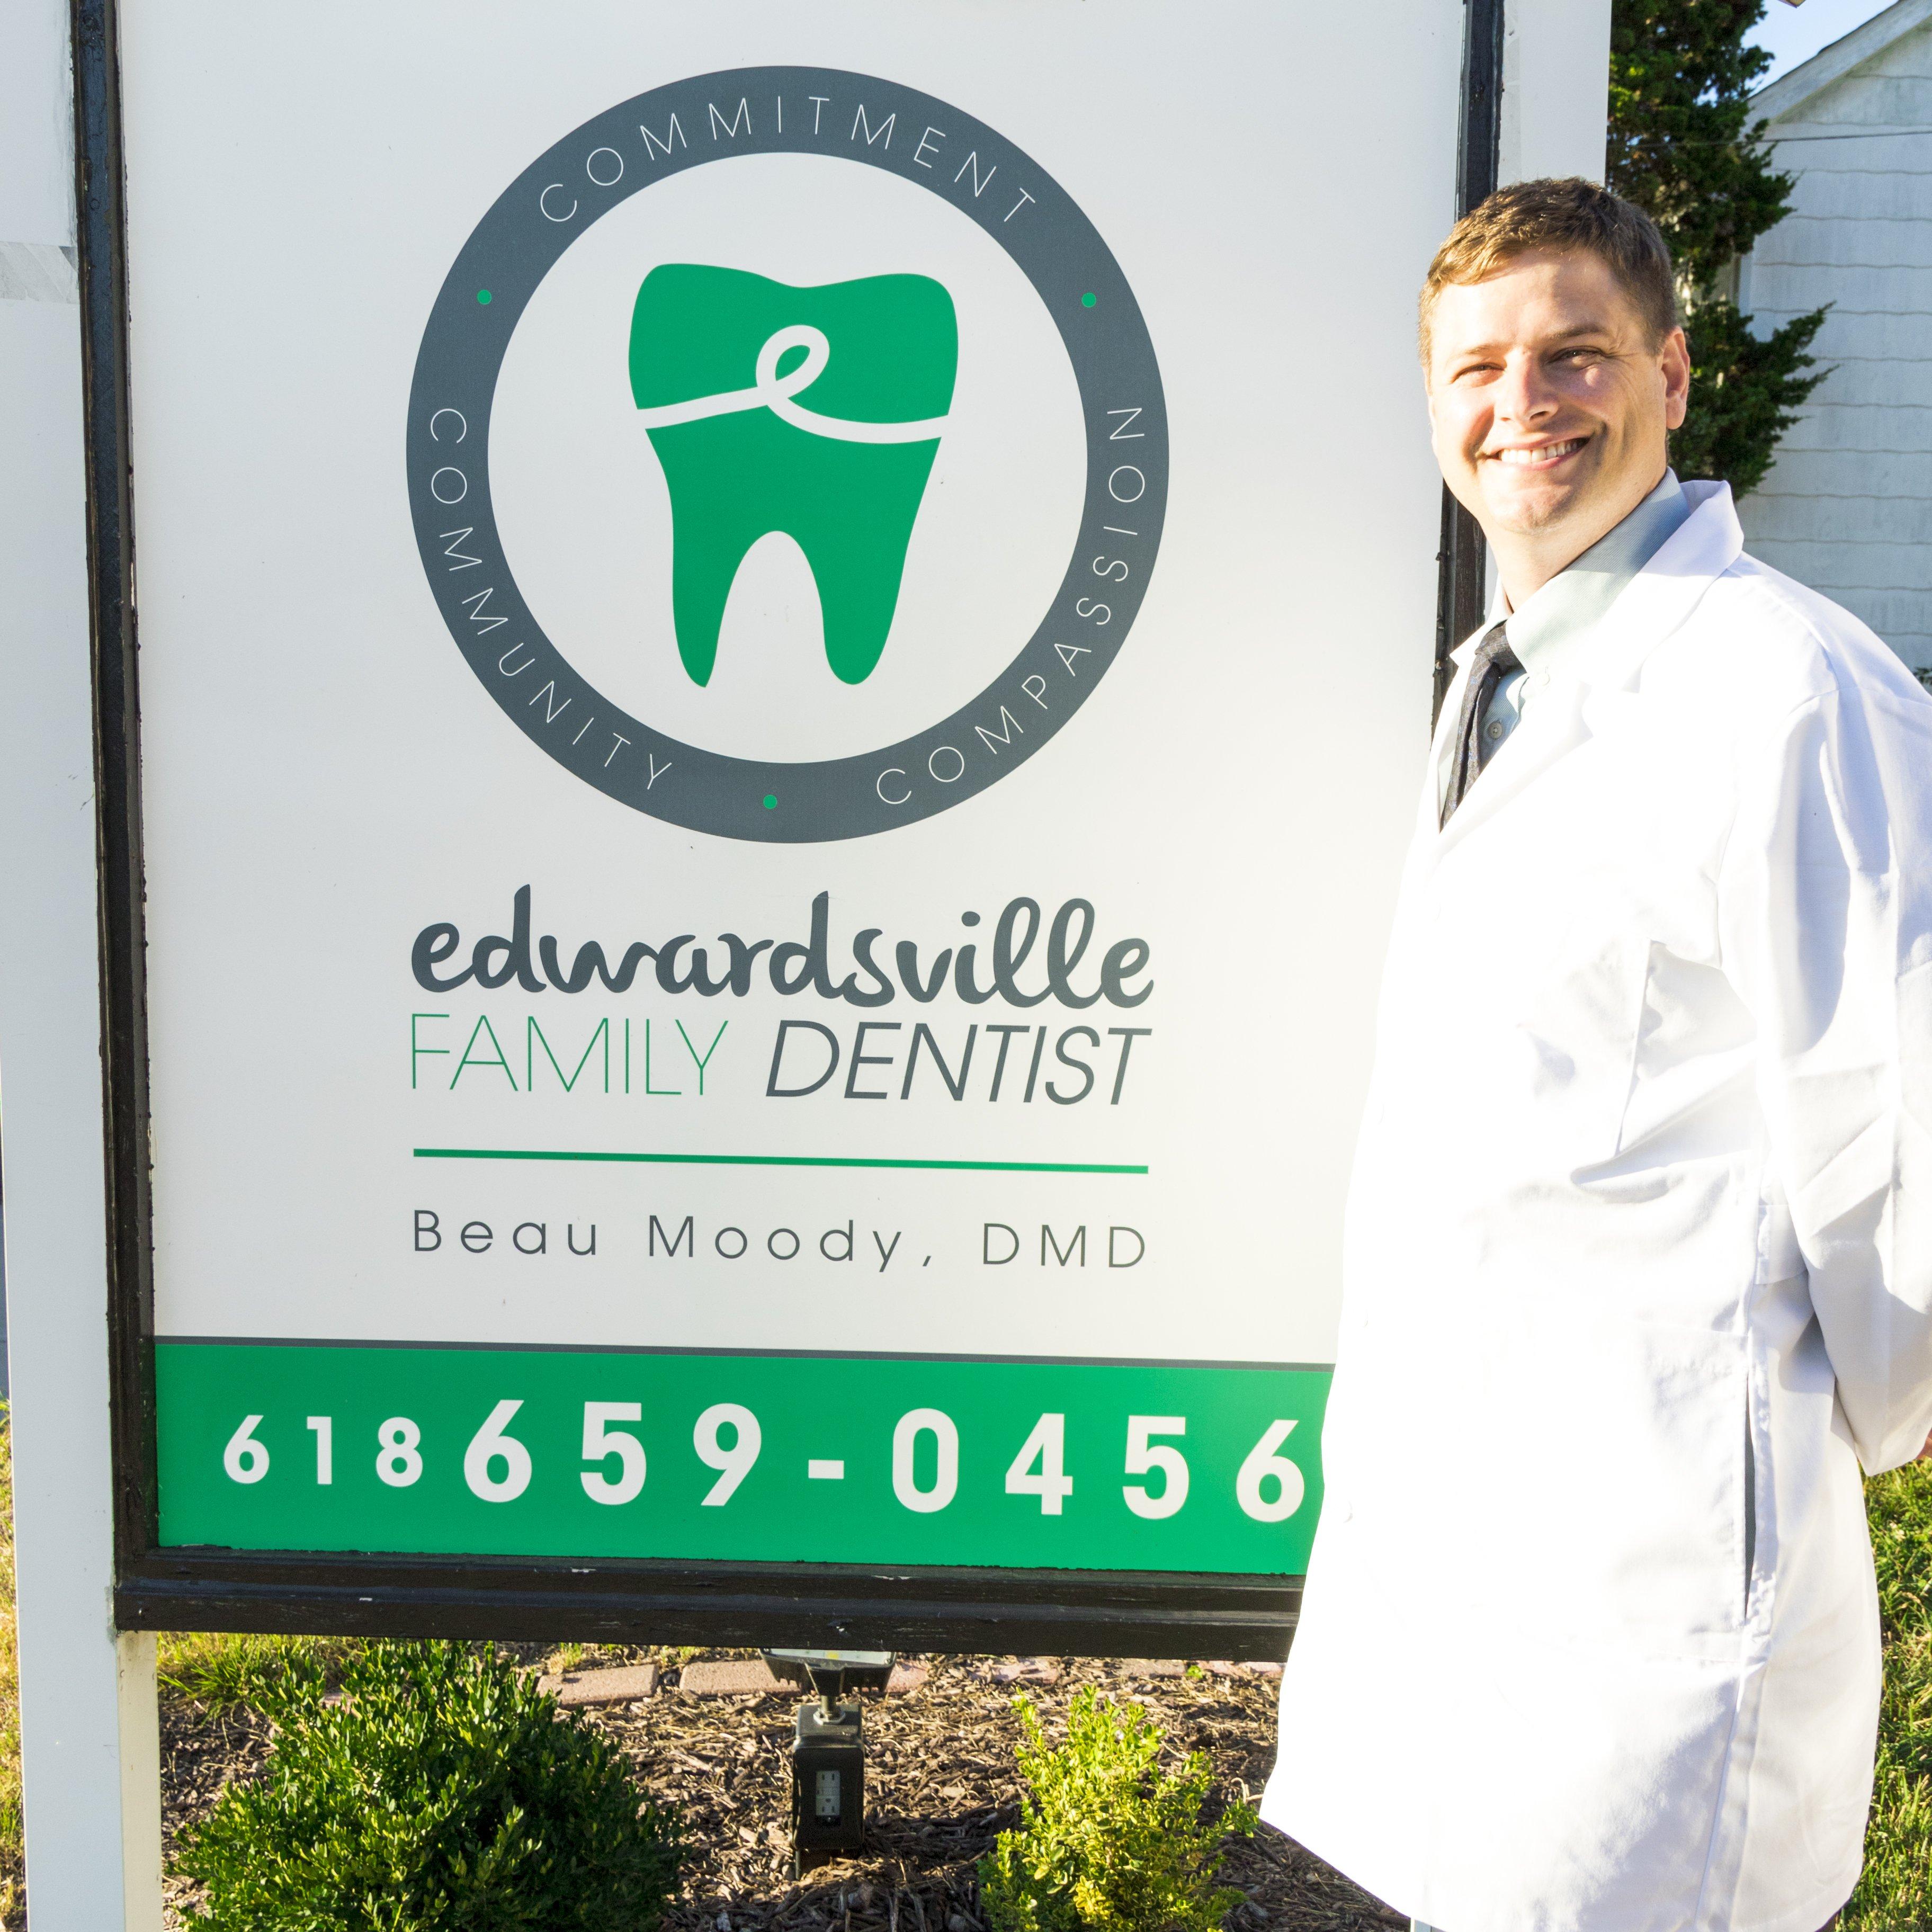 Edwardsville Family Dentist located near Edwardsville, IL post office